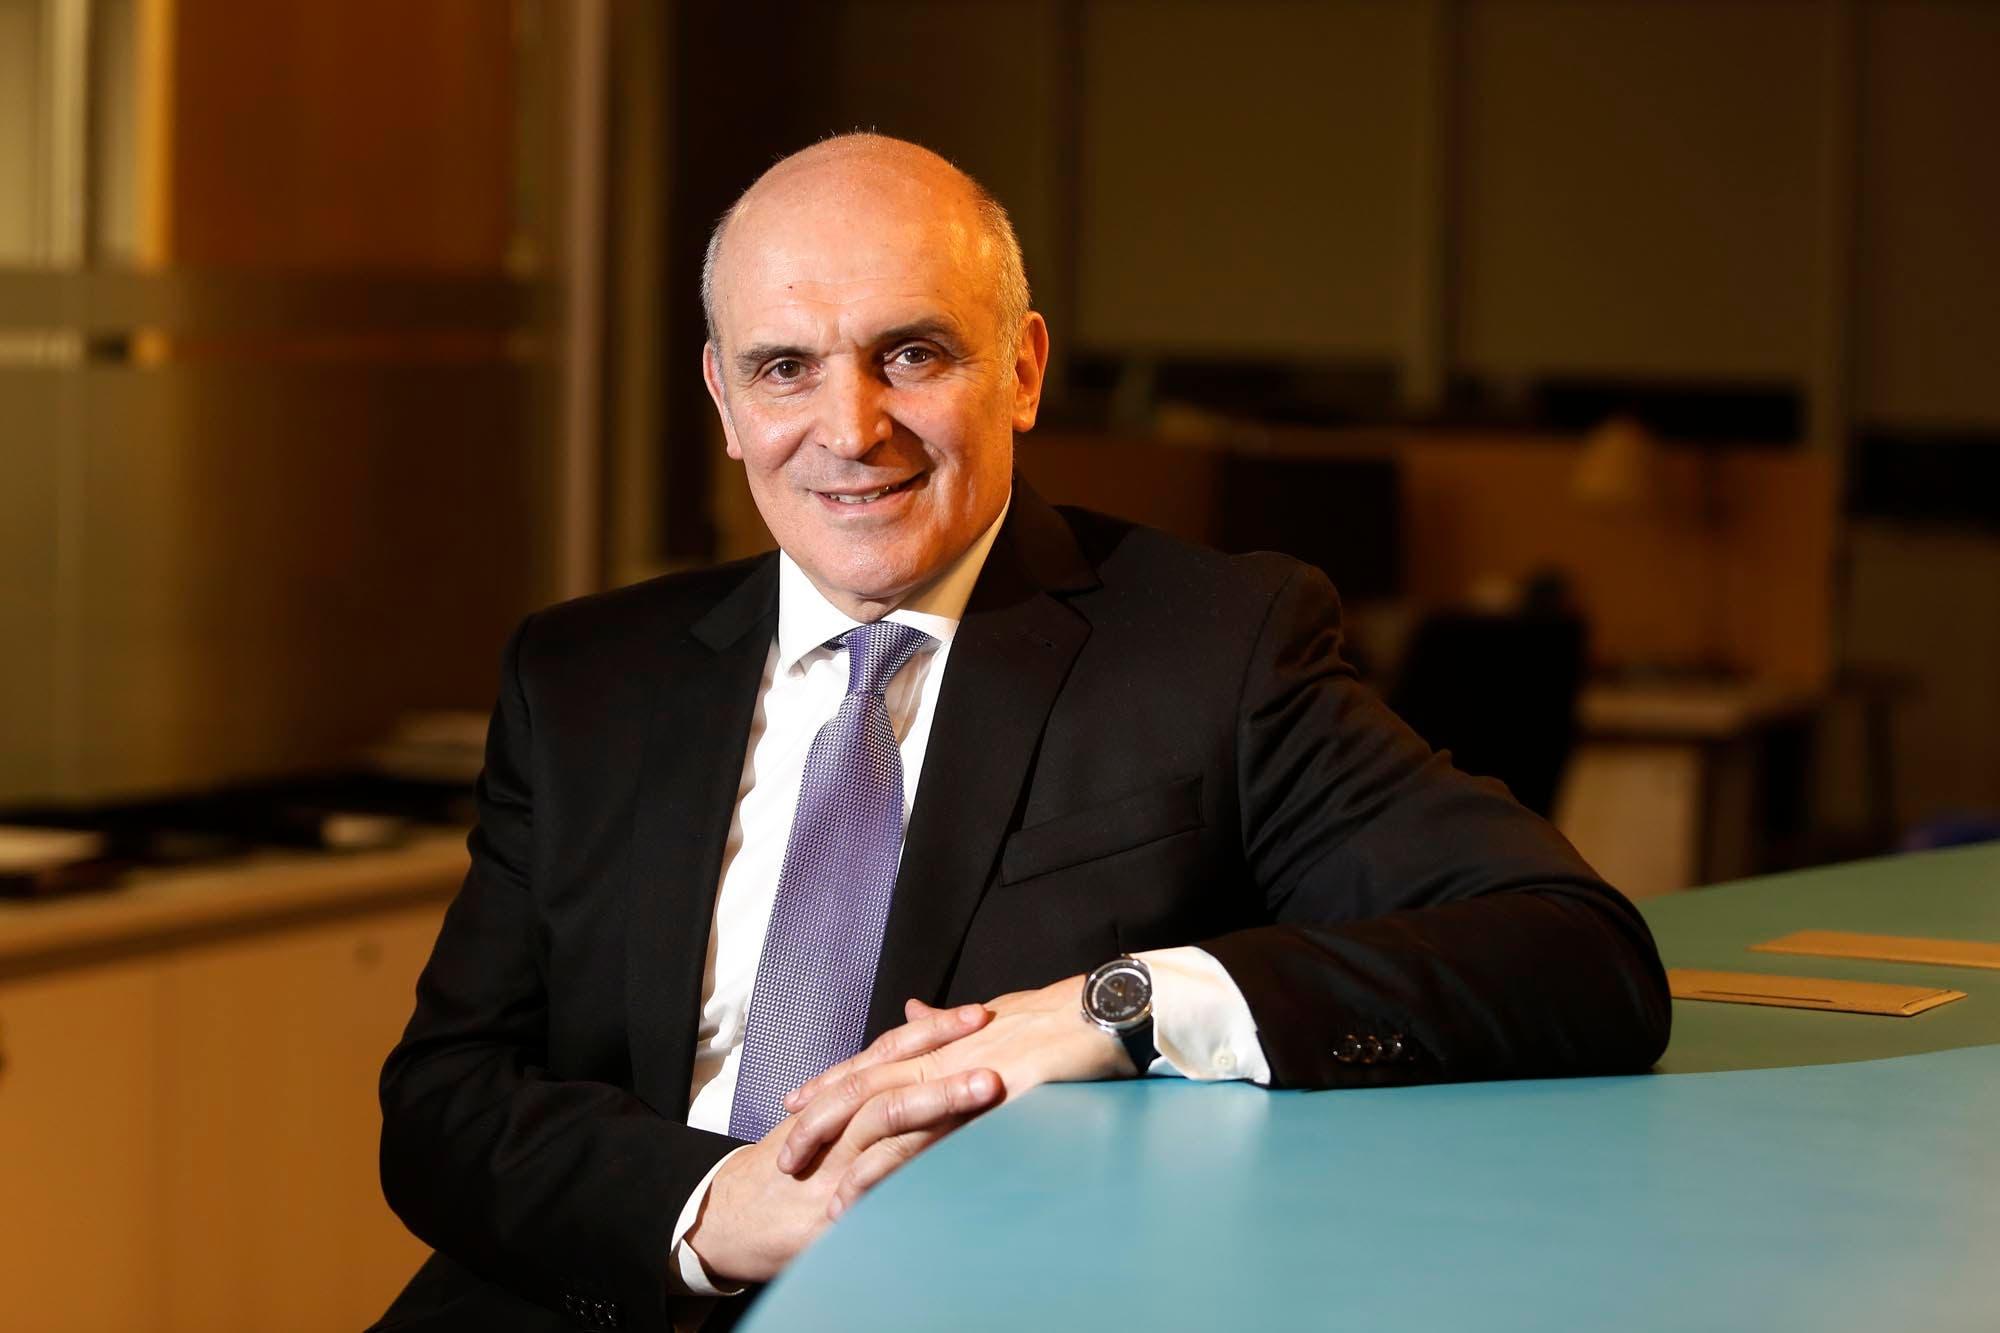 elezioni argentina 2019 candidati coalizioni espert